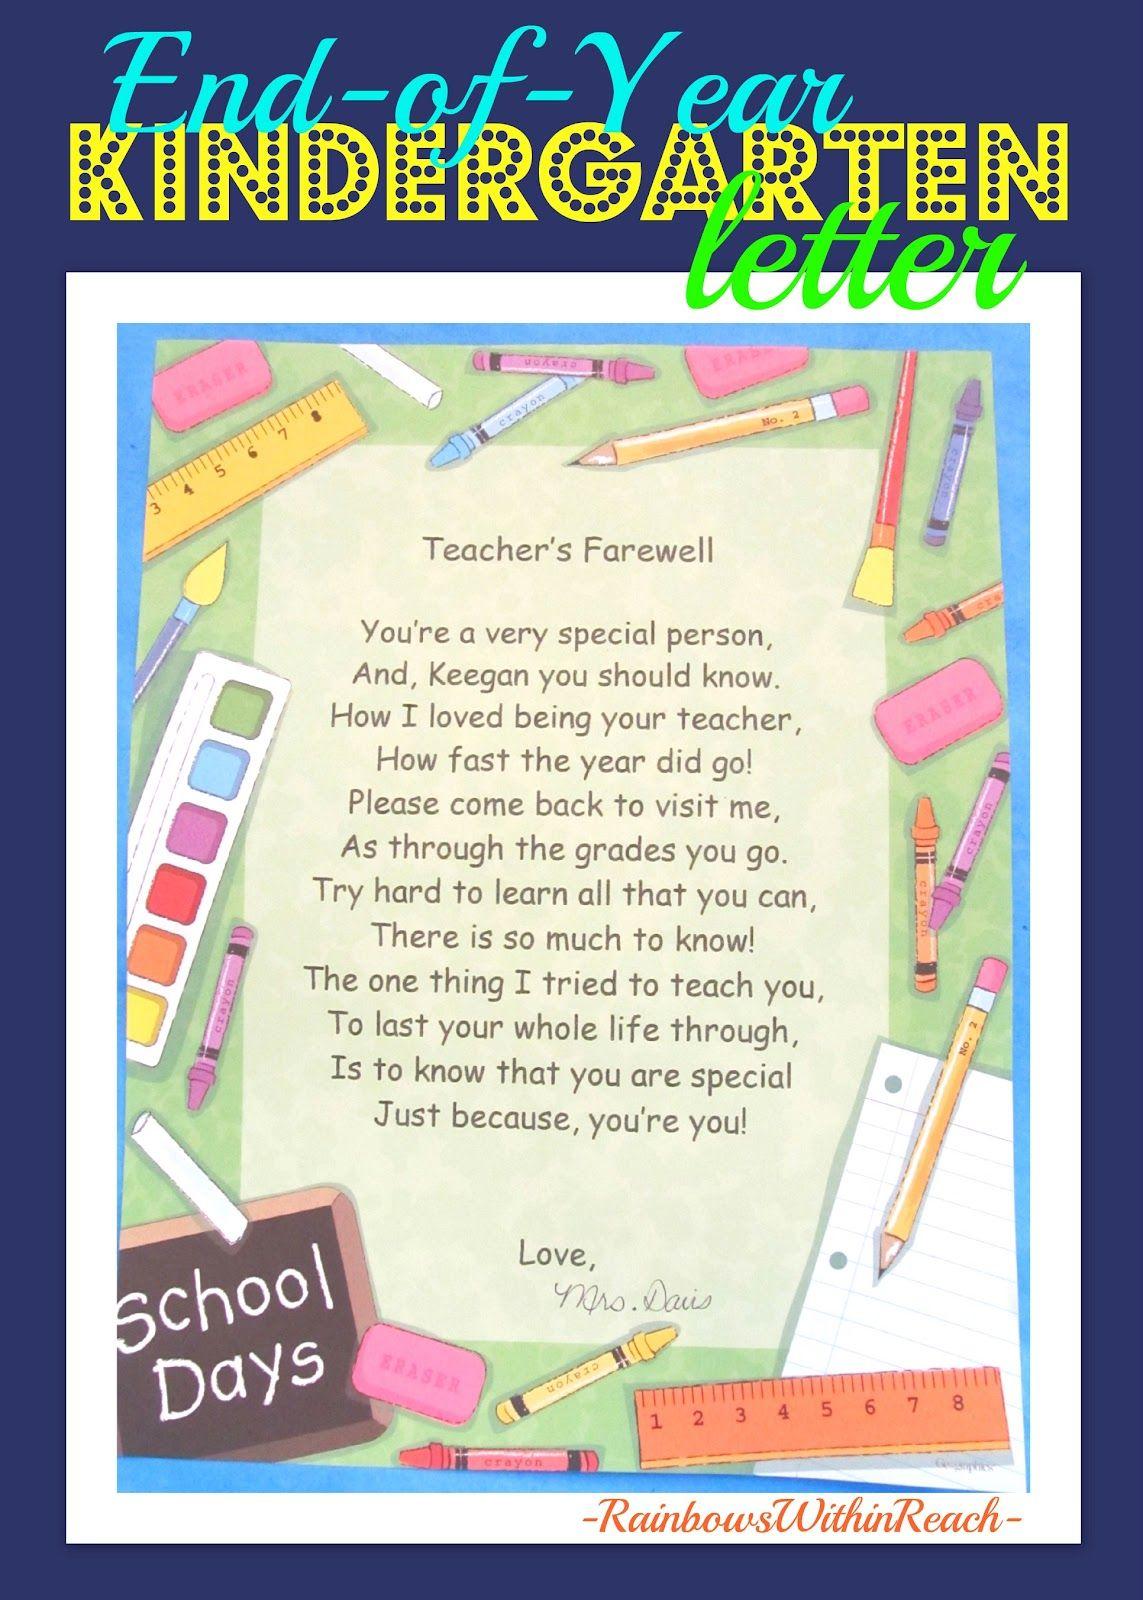 End of the year keepsakes rhymes teacher pre school and school end of the year keepsakes rhymes letter to studentsteacher altavistaventures Gallery